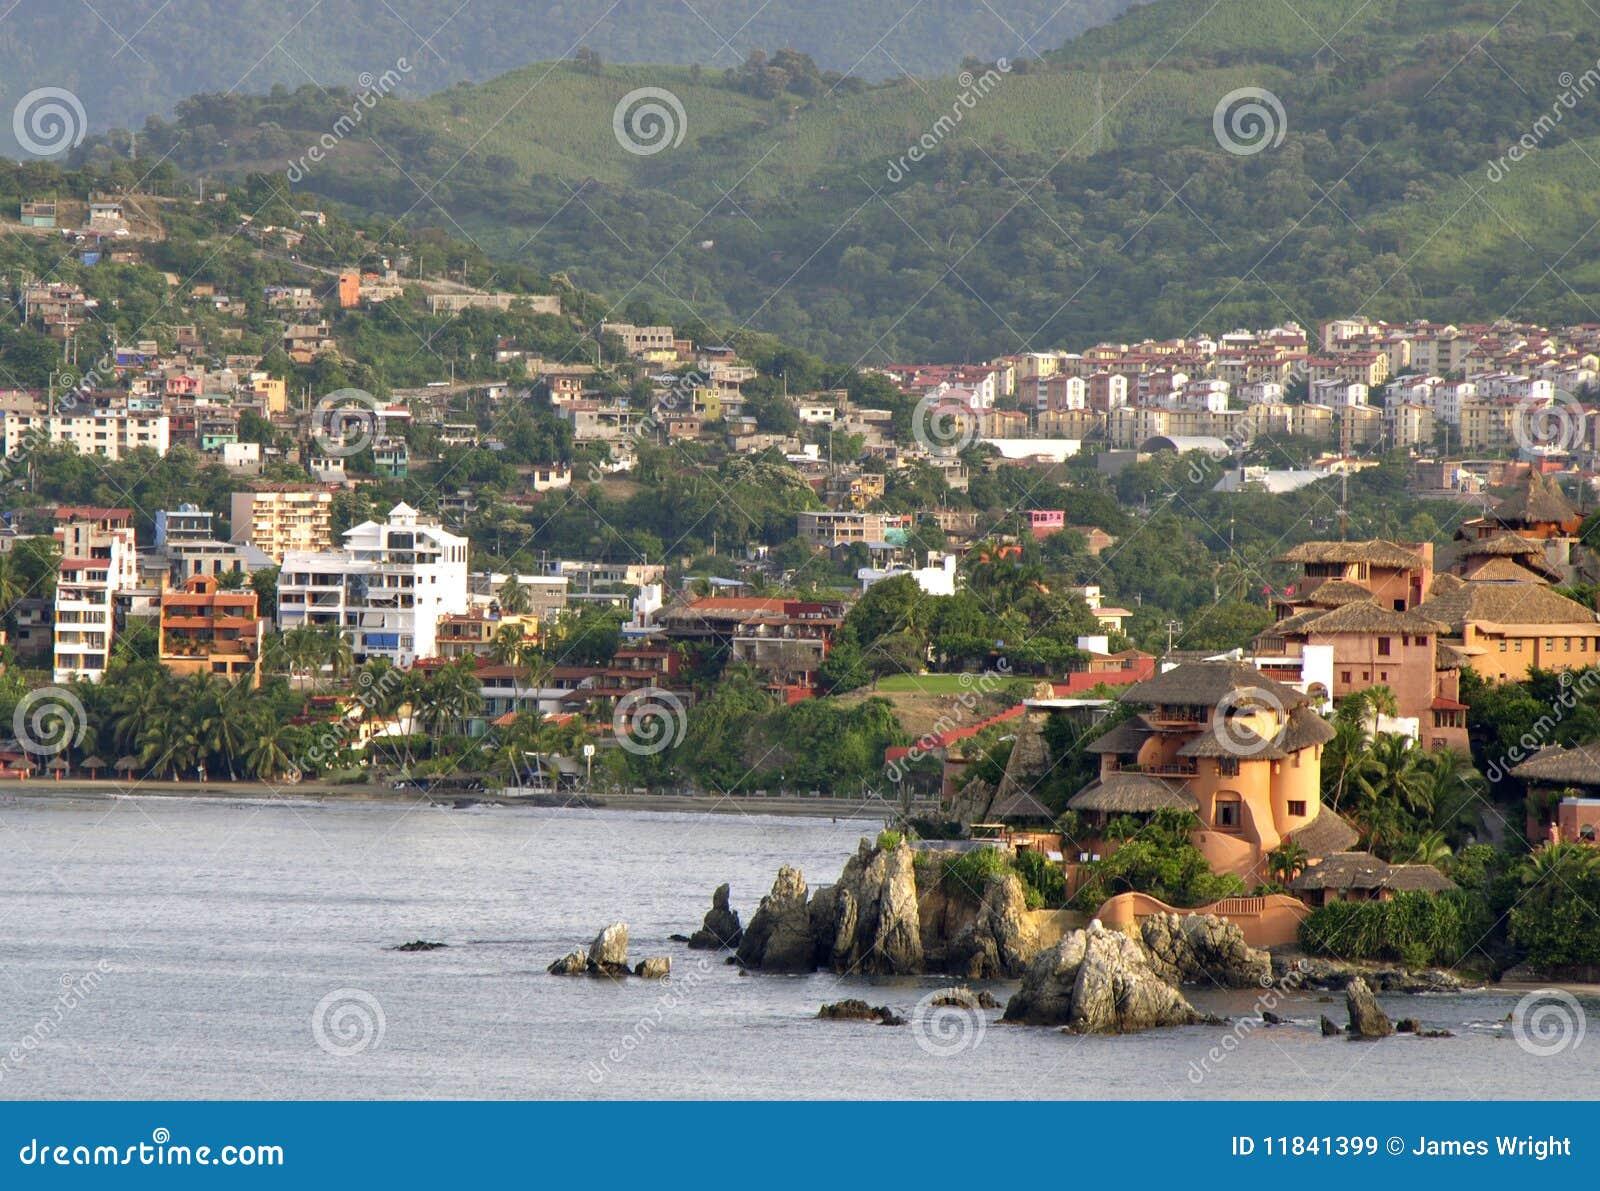 Meksiko - Page 3 Mexican-seaside-village-11841399